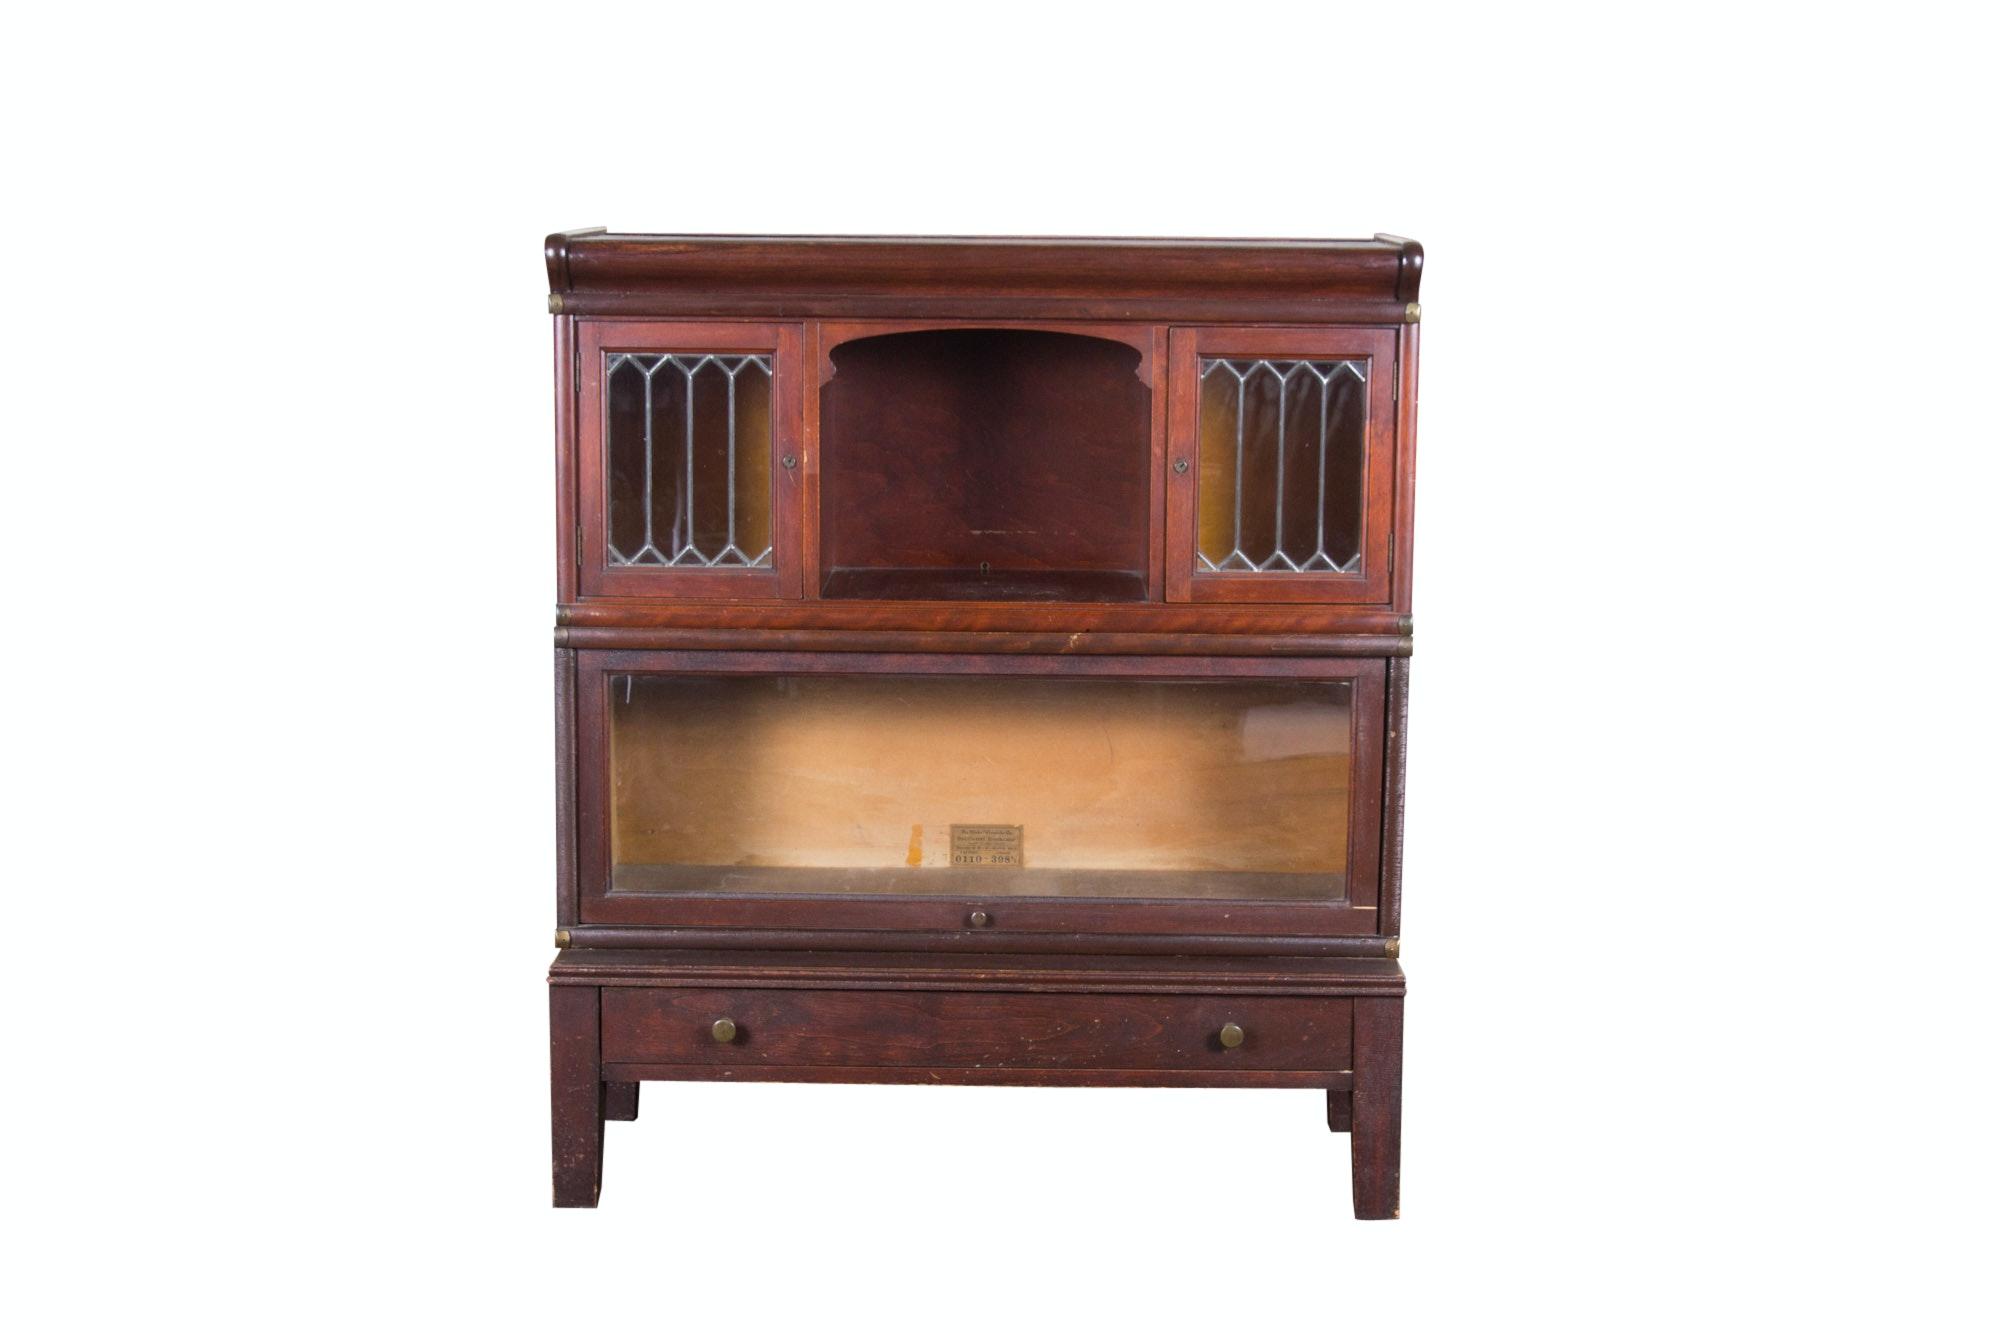 Globe-Wernicke Sectional Mahogany Bookcase